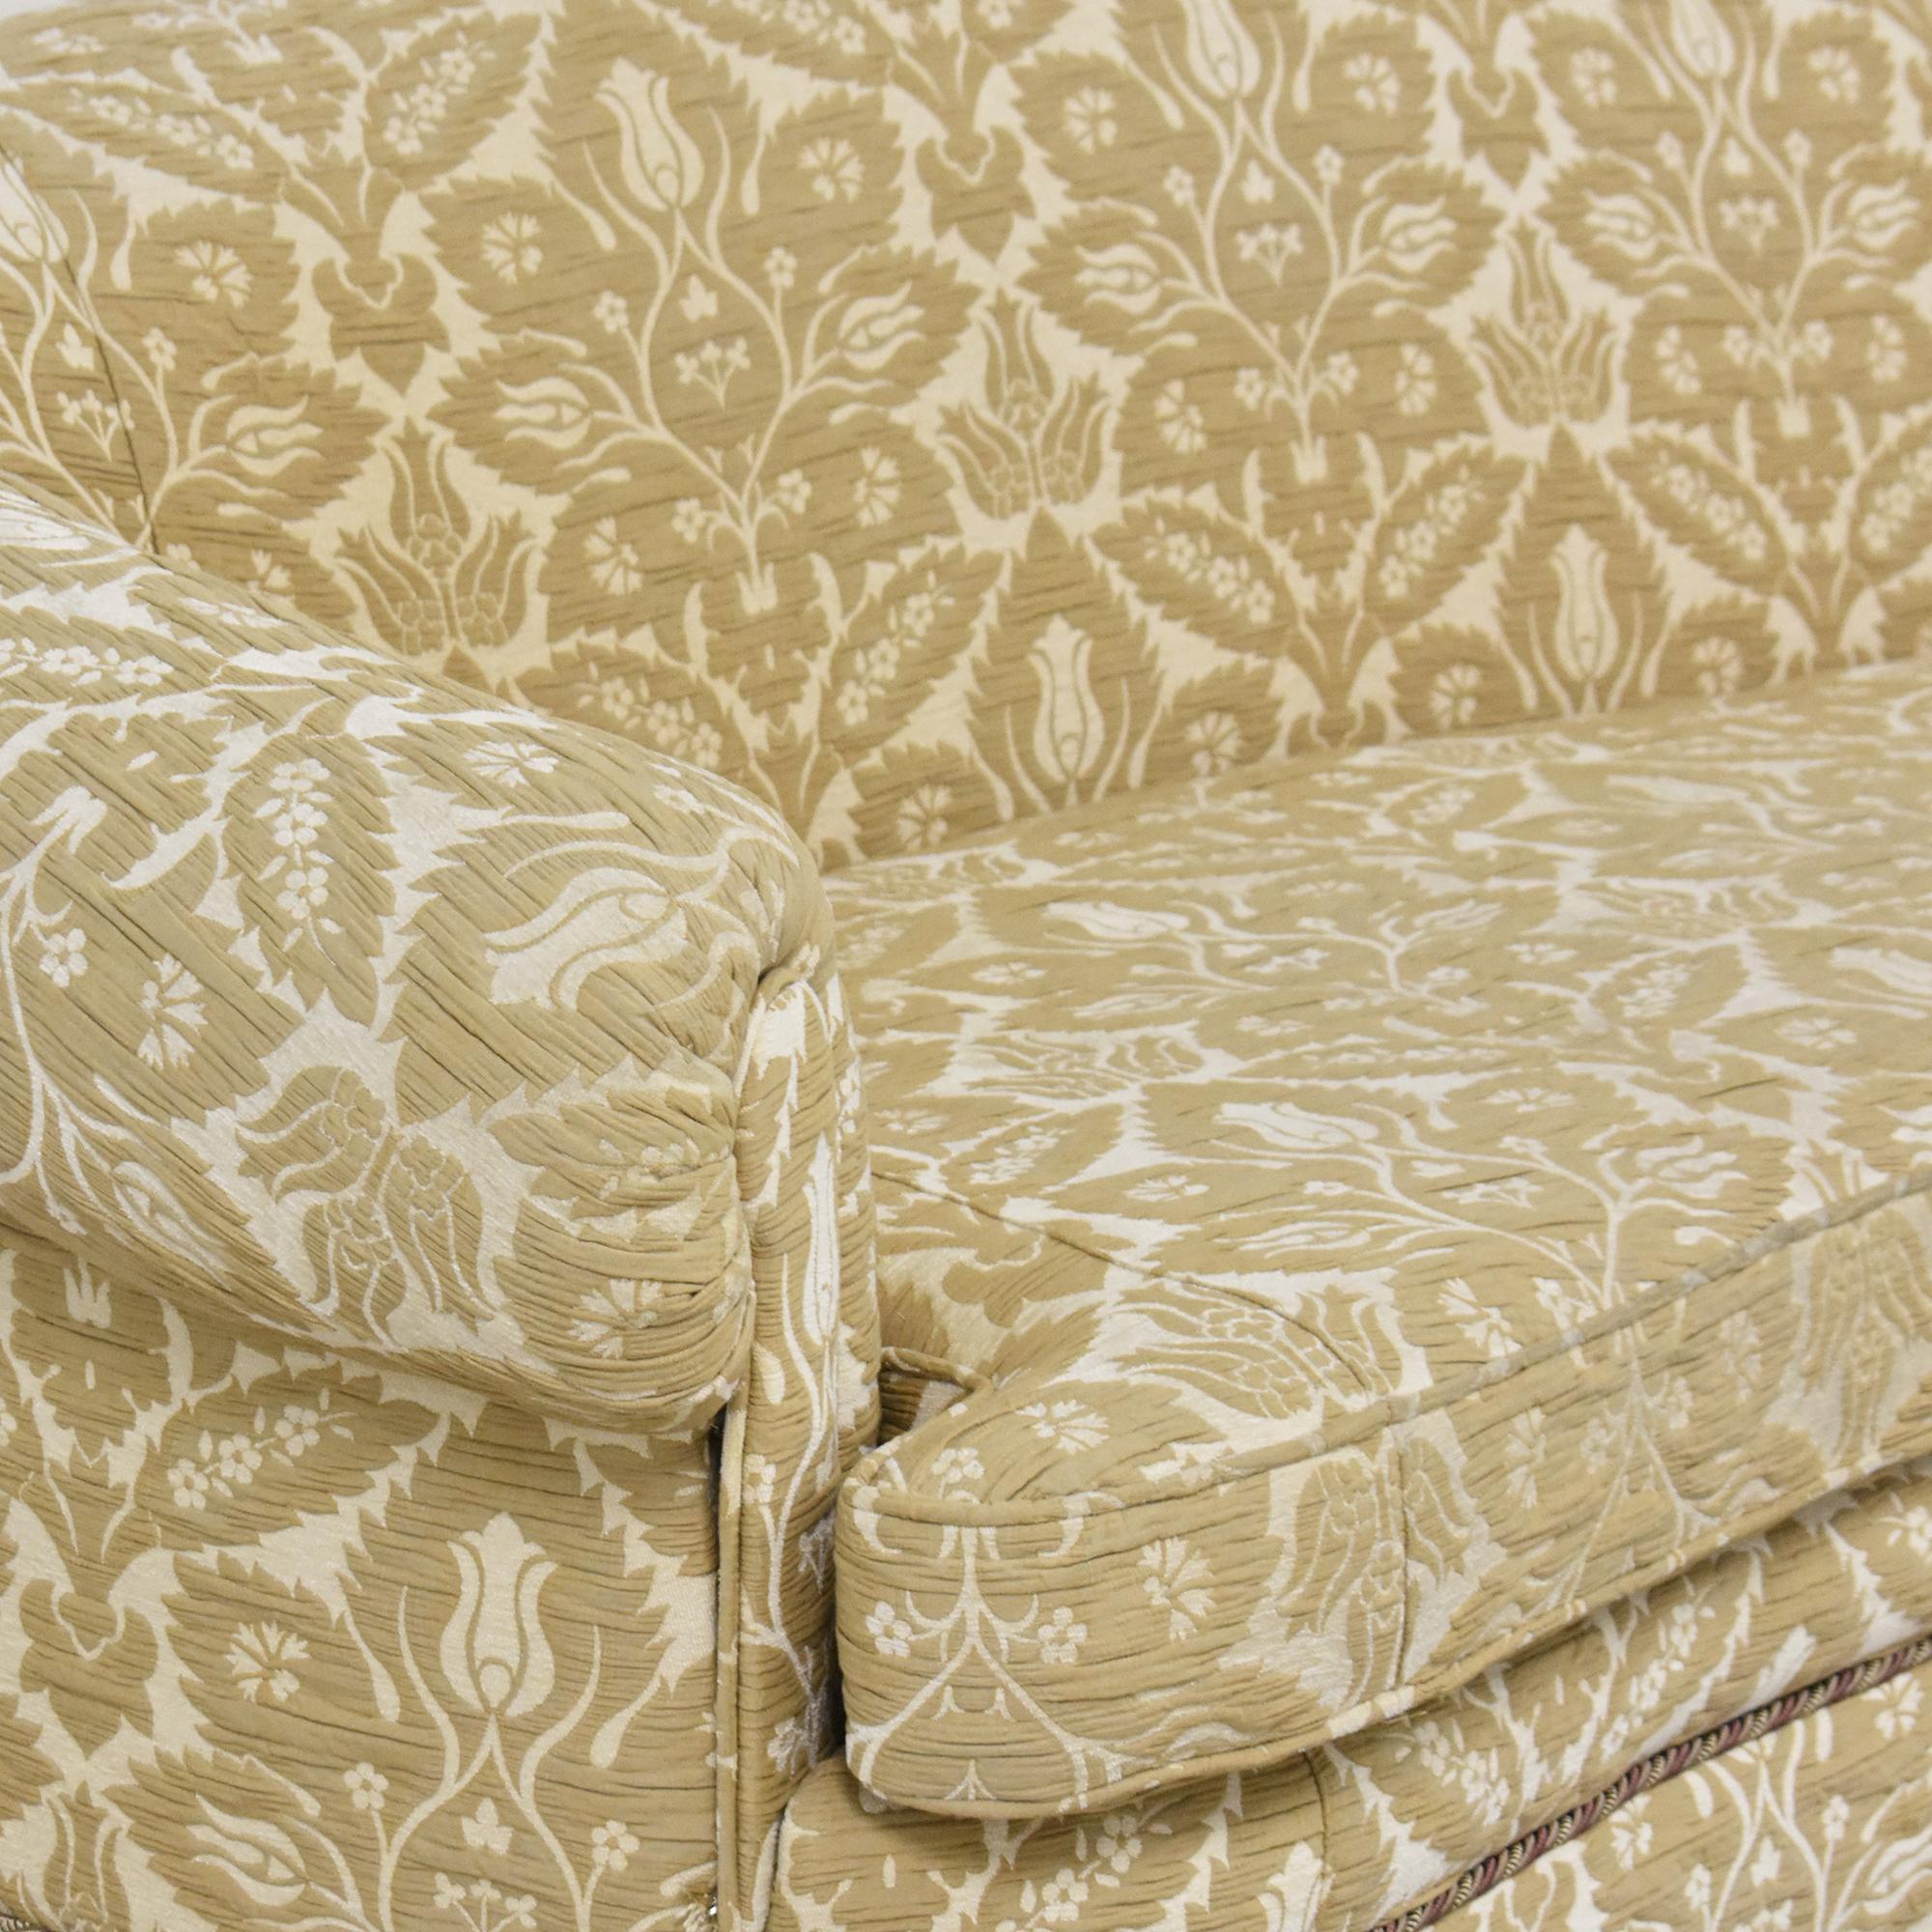 Sherrill Furniture Curved Camel Back Sofa / Sofas